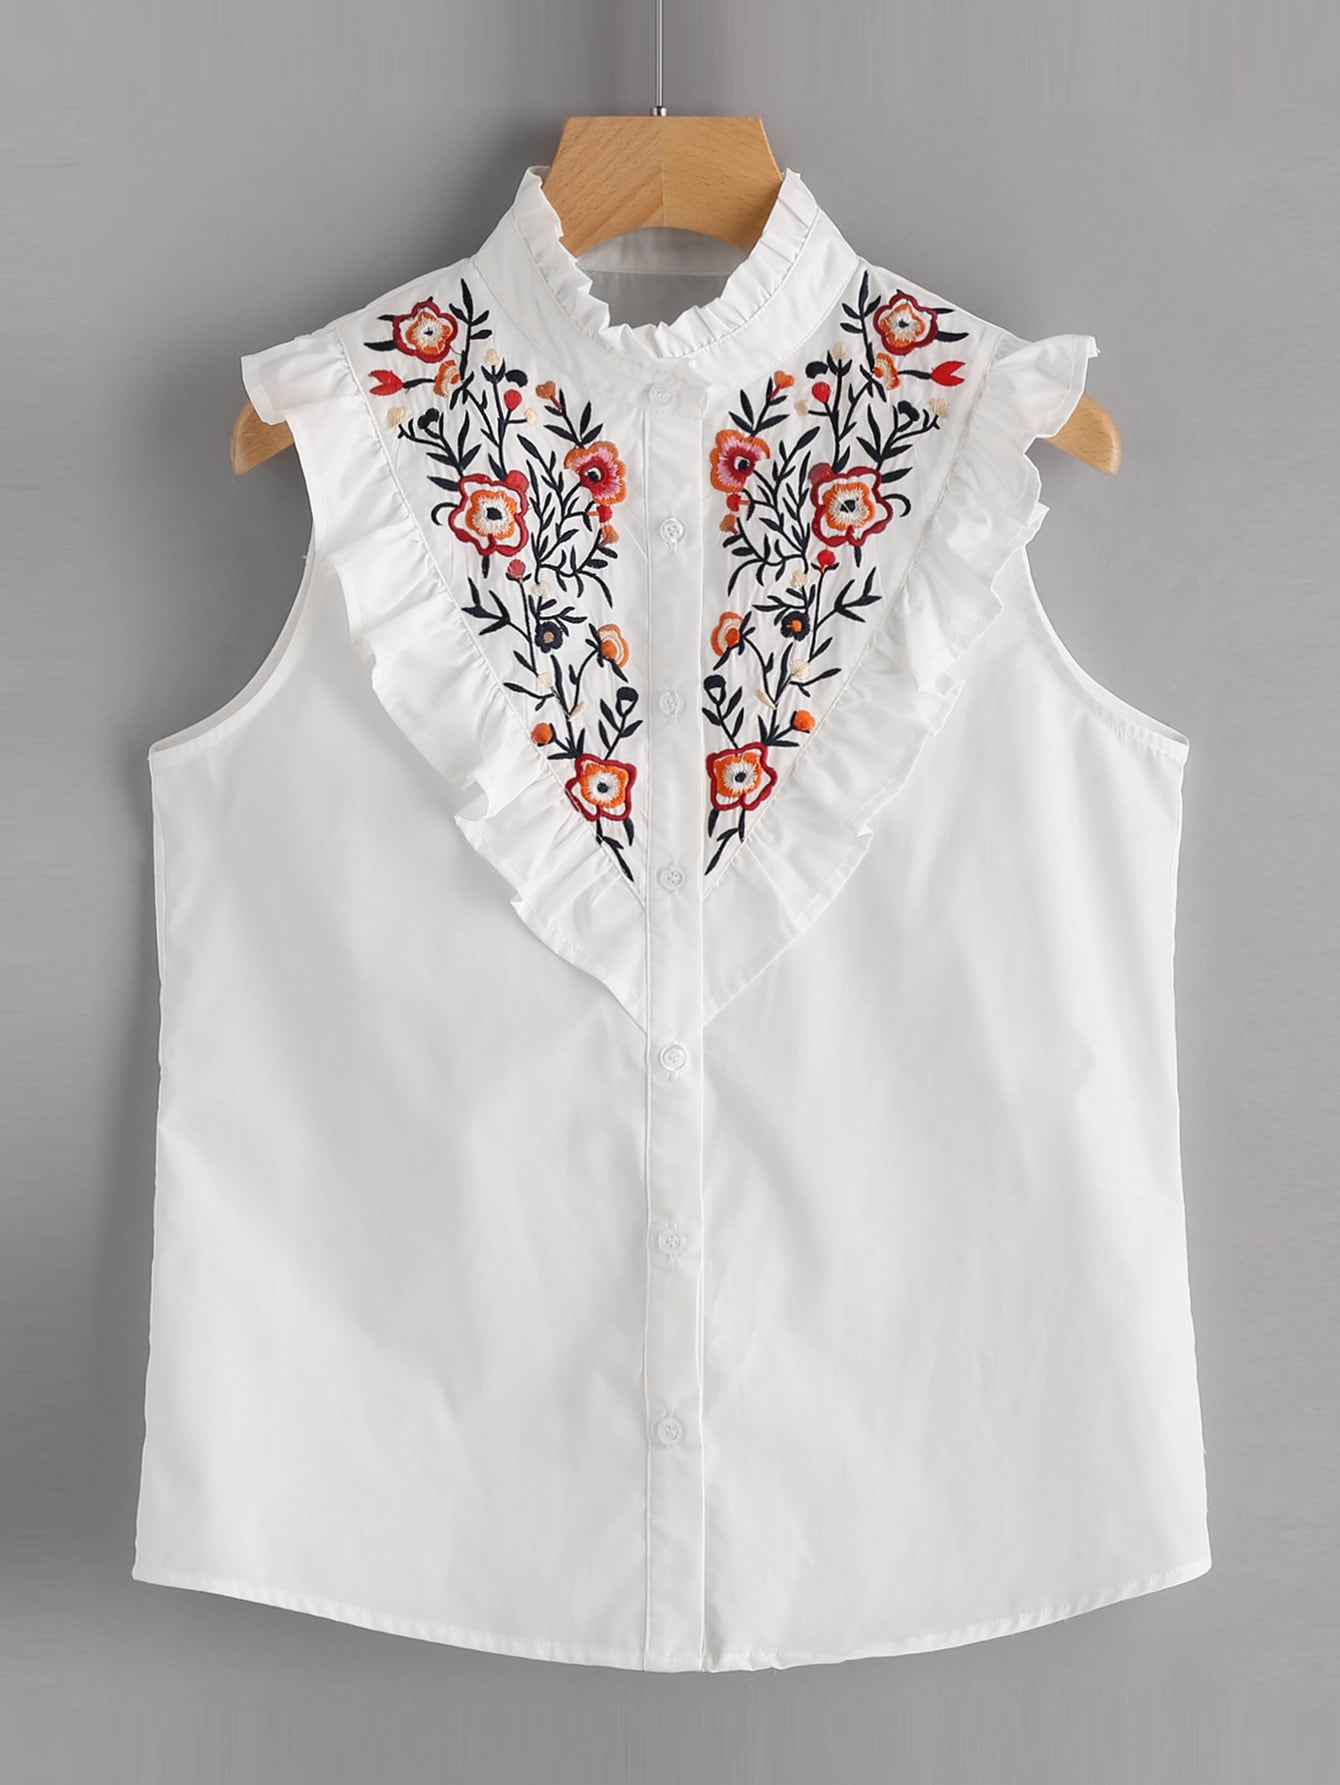 Фото Frill Trim Floral Embroidered Yoke Sleeveless Blouse. Купить с доставкой